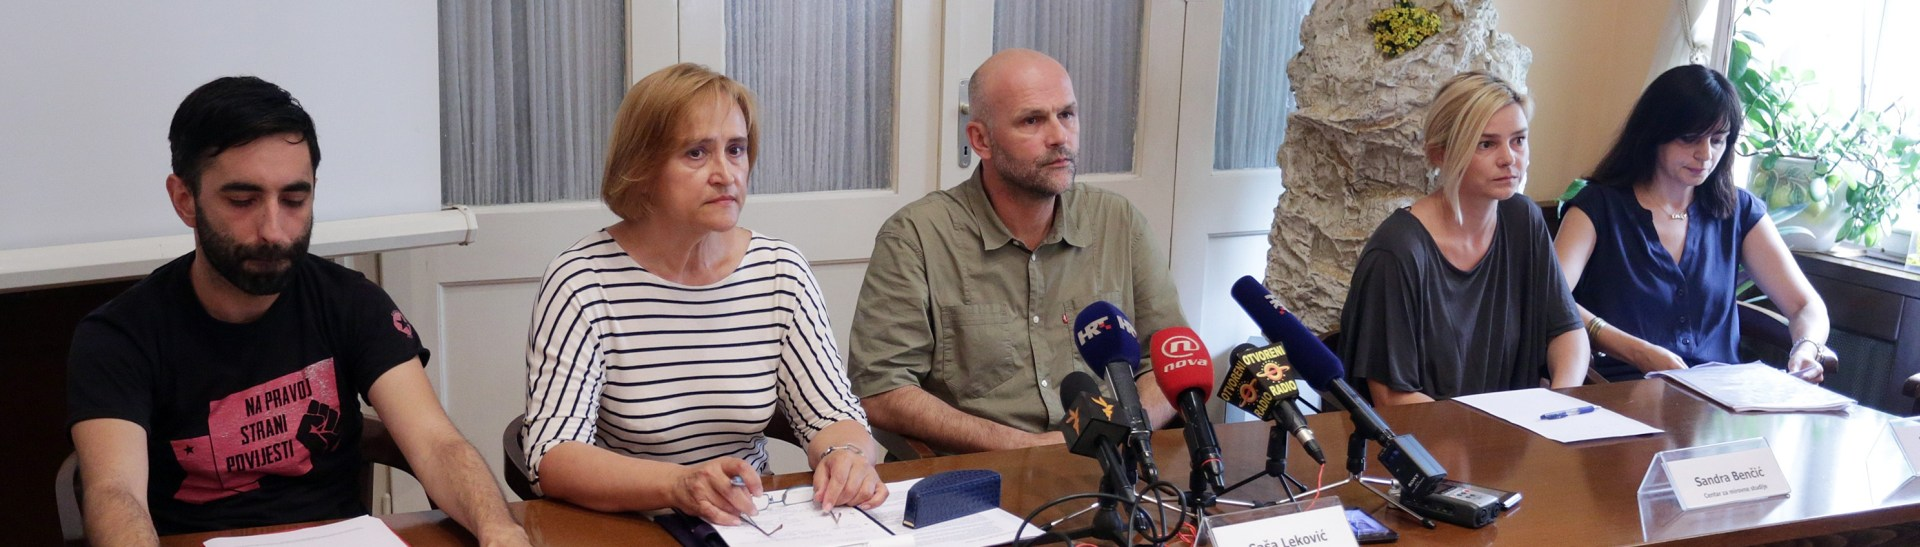 HOMOFOB I HOMOFREND: Zagreb Pride smatra da im se cenzurira njihov rad